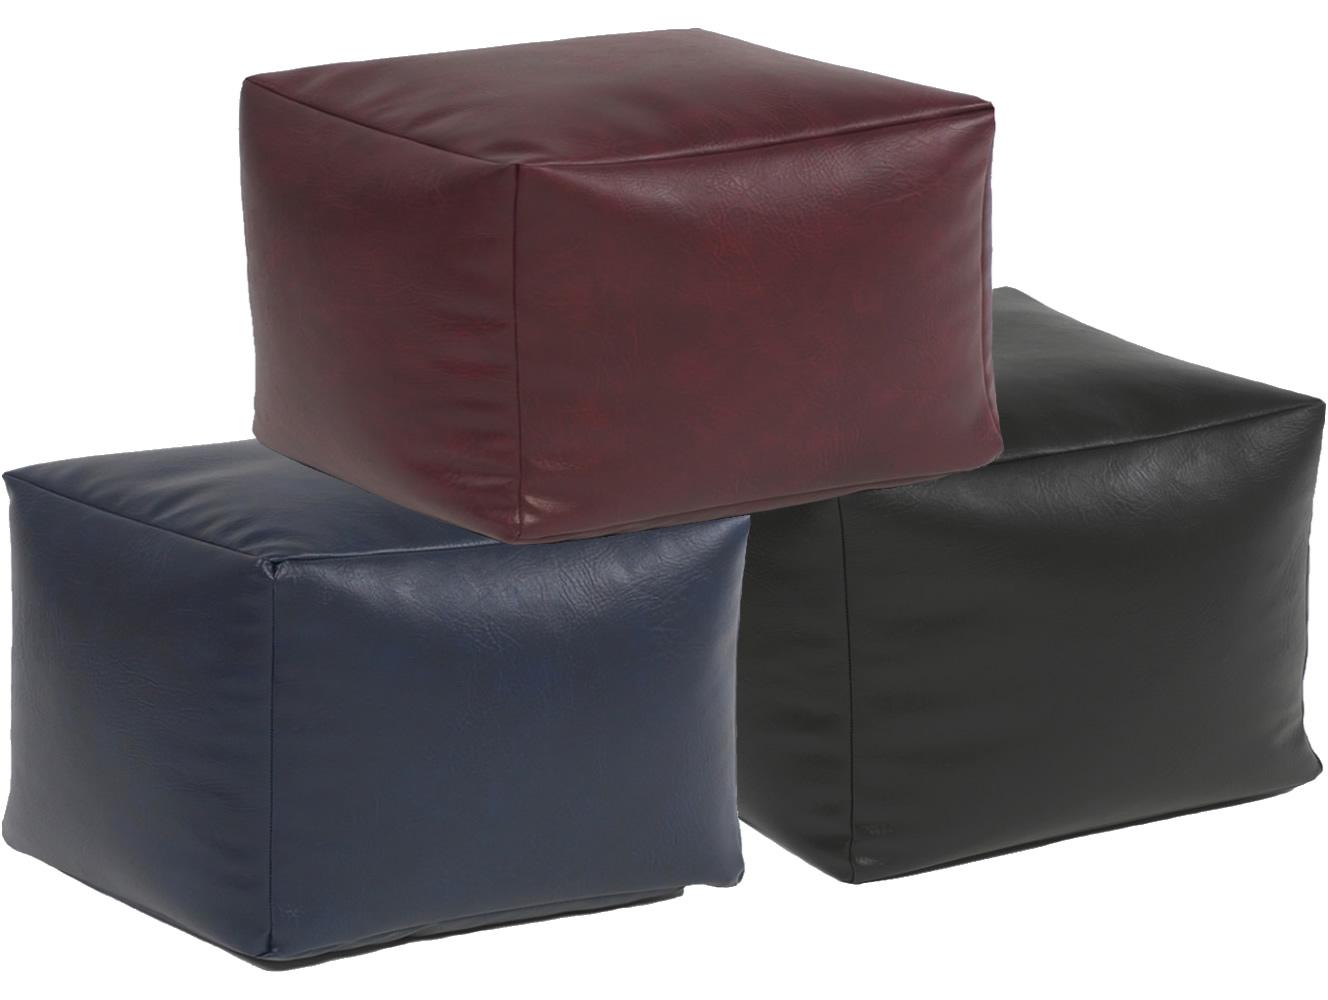 Pleasant Versatile Footstool Creativecarmelina Interior Chair Design Creativecarmelinacom